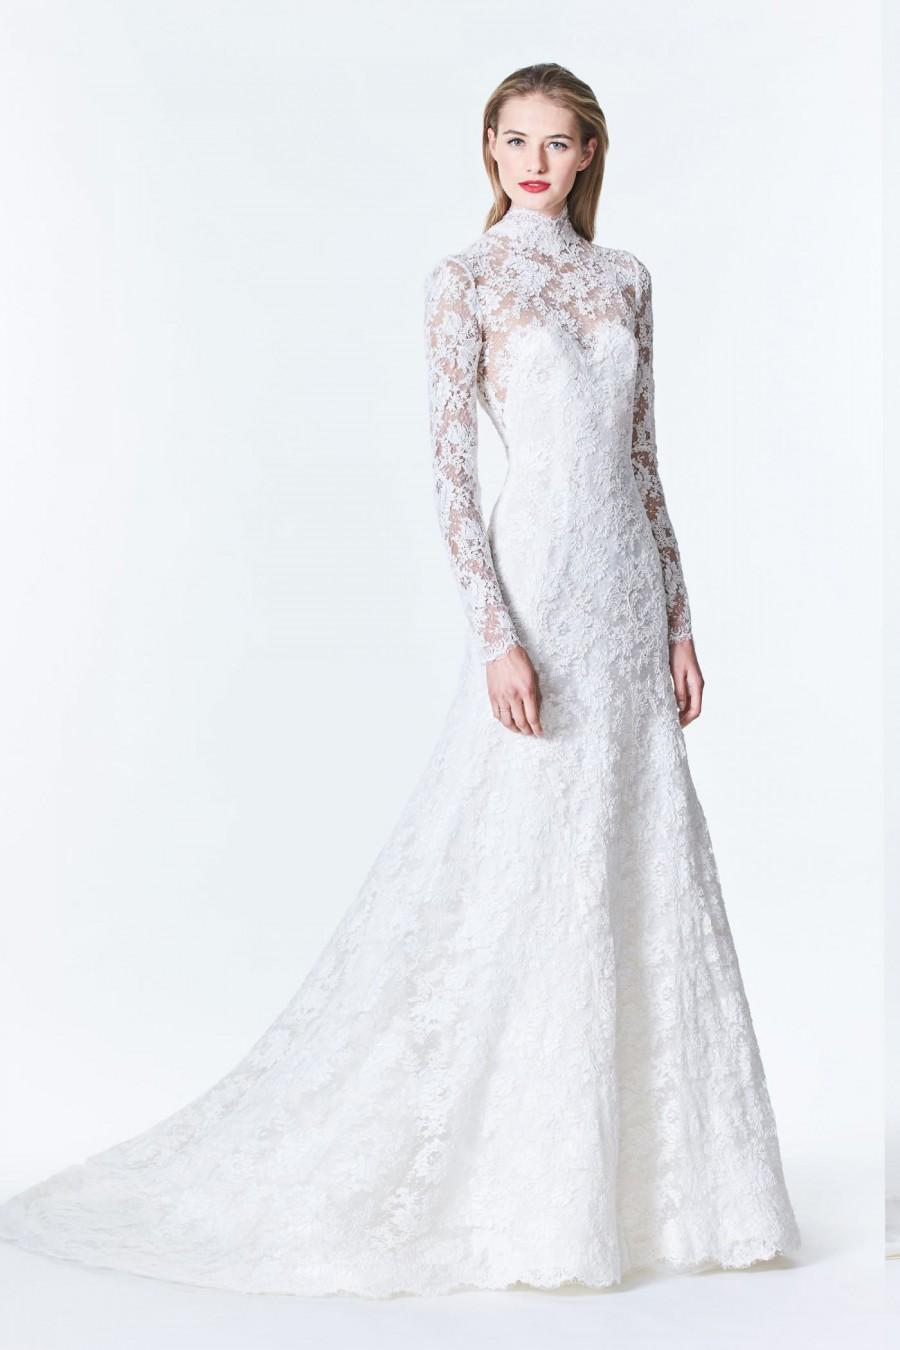 40 Snow Ready Winter Wedding Dresses